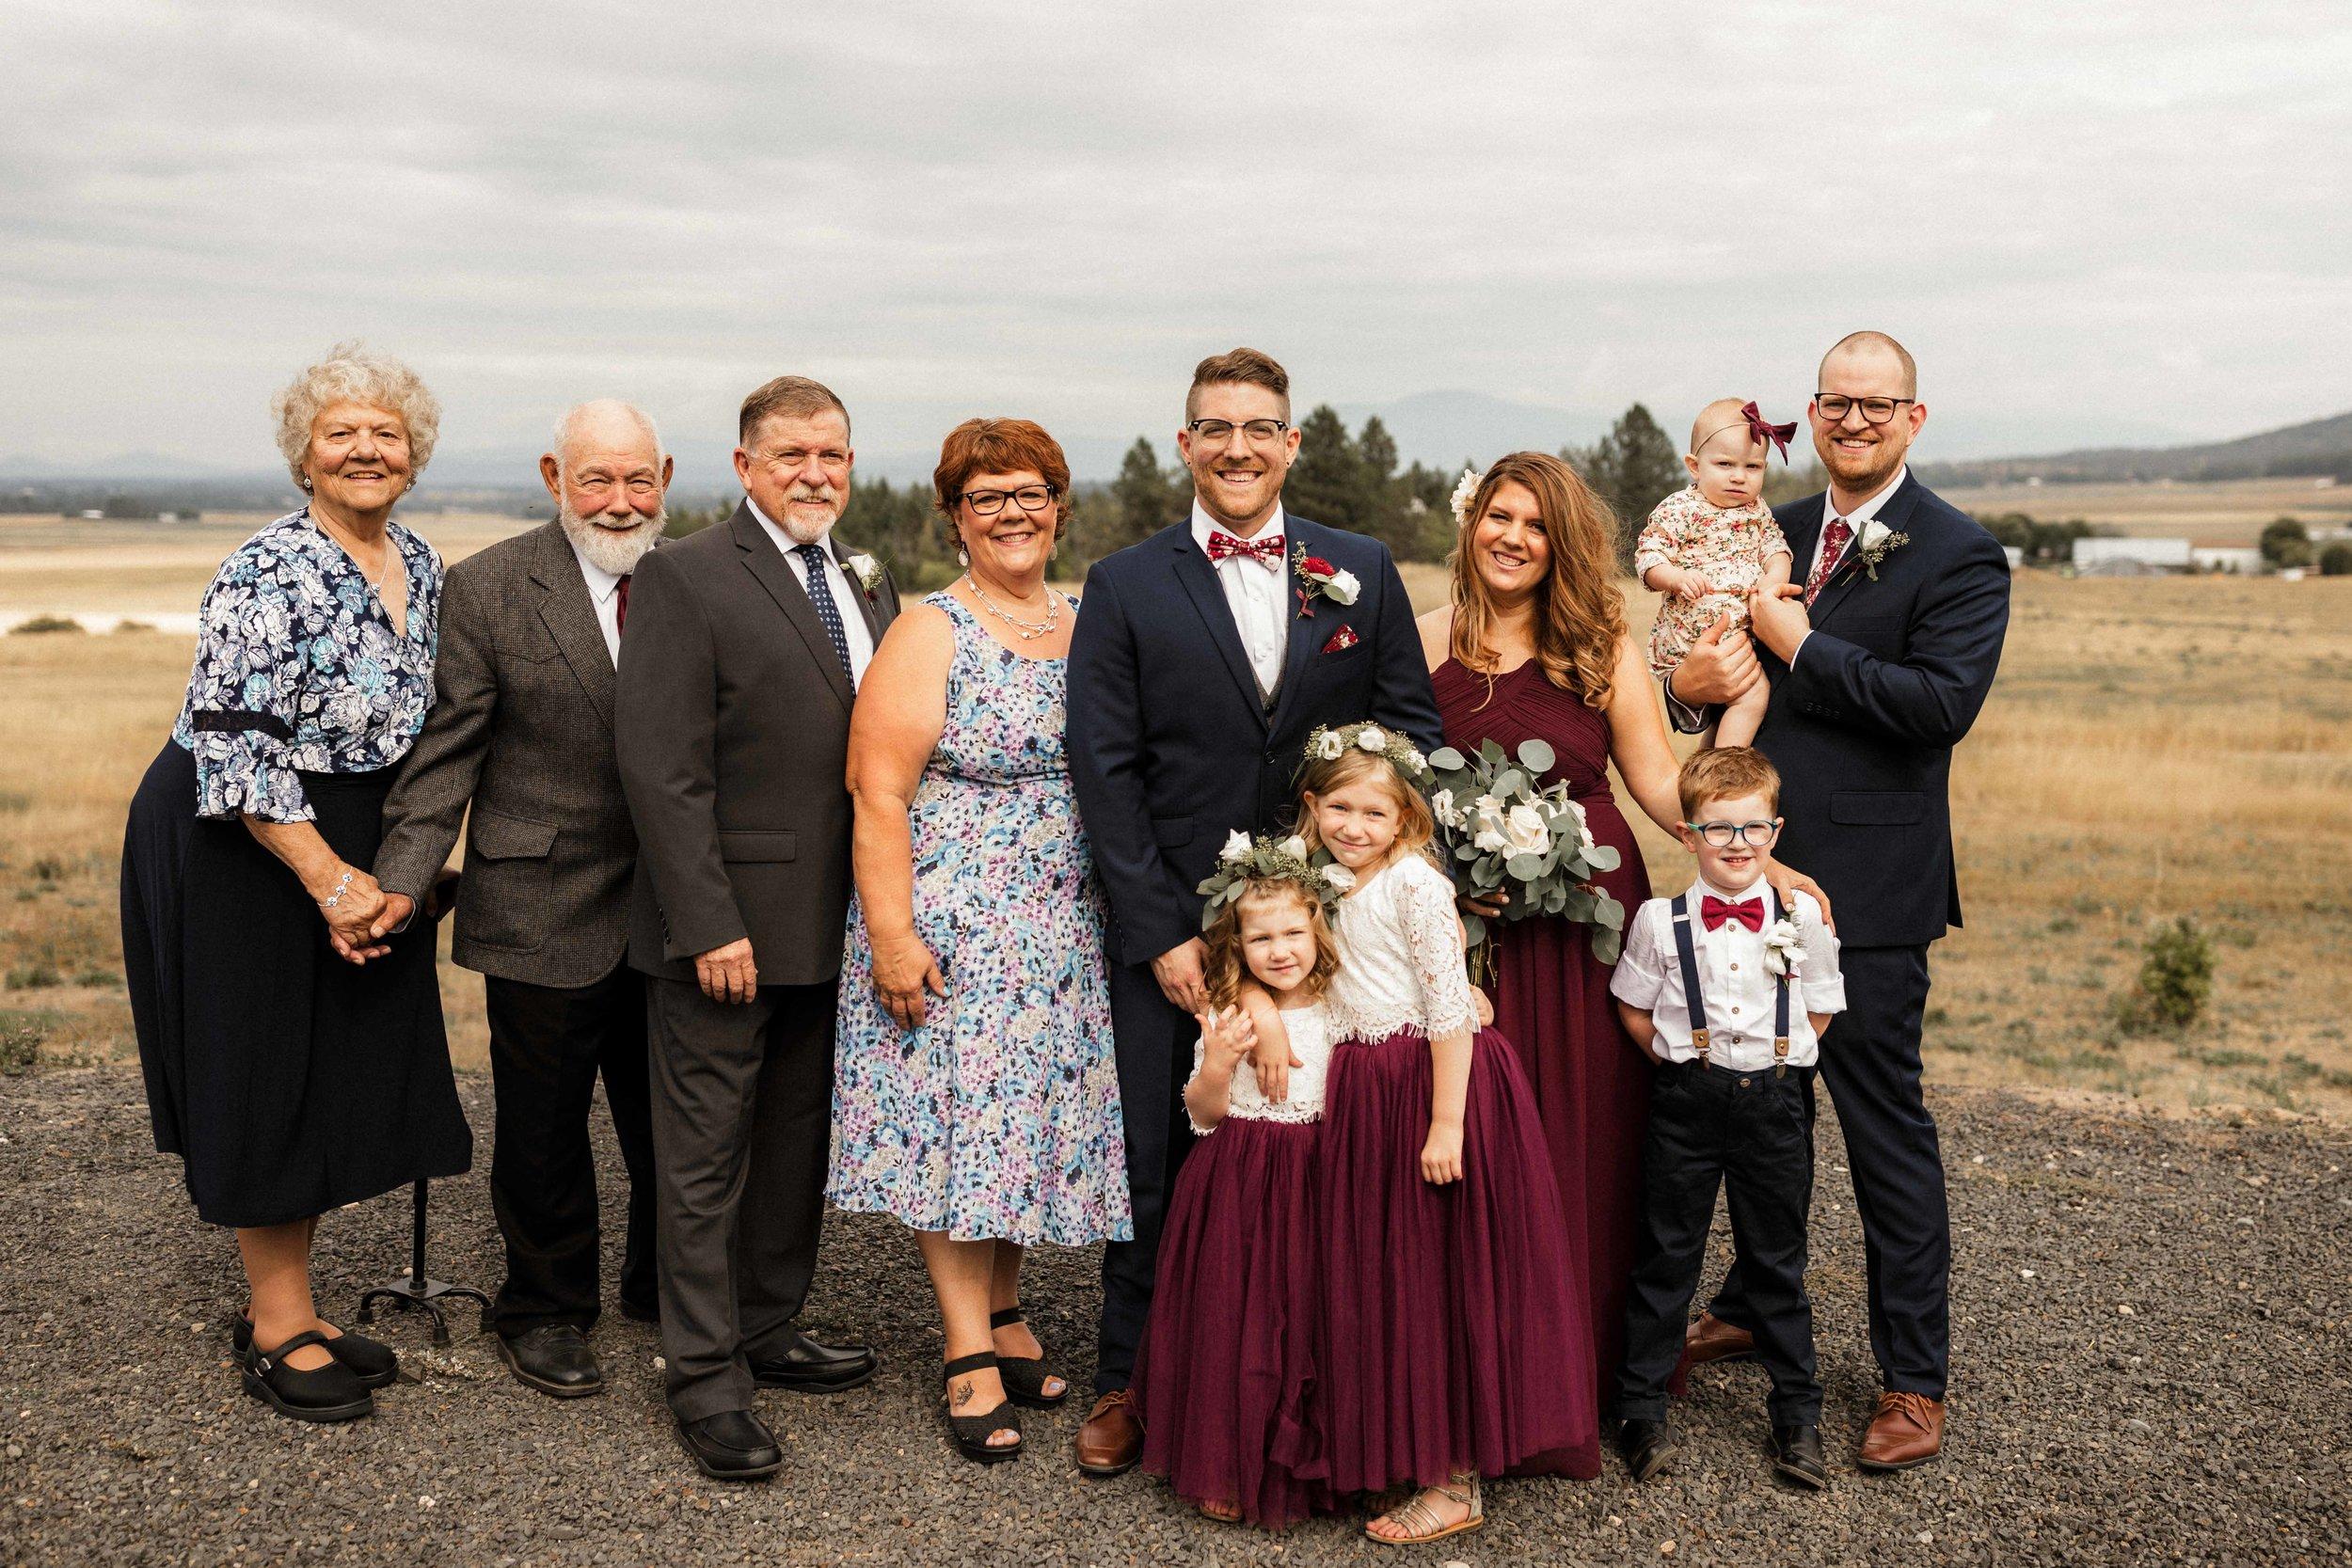 lavender-manor-wedding-34.jpg